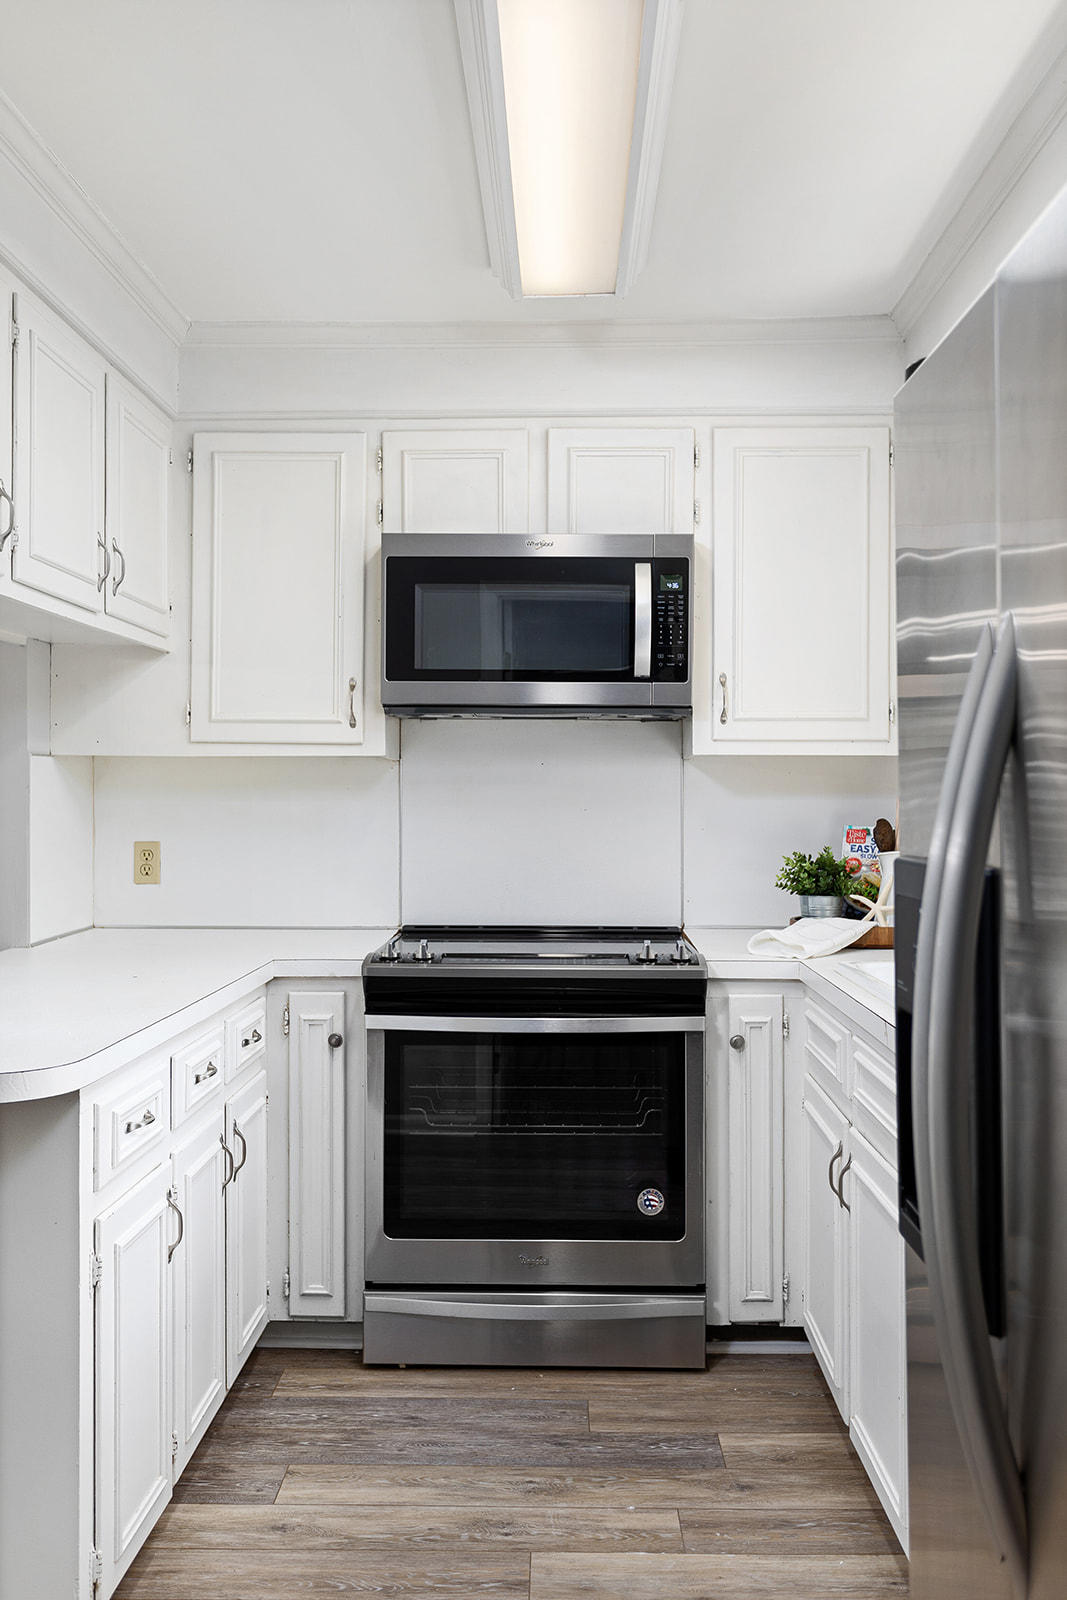 Shemwood II Homes For Sale - 954 Sea Gull, Mount Pleasant, SC - 10